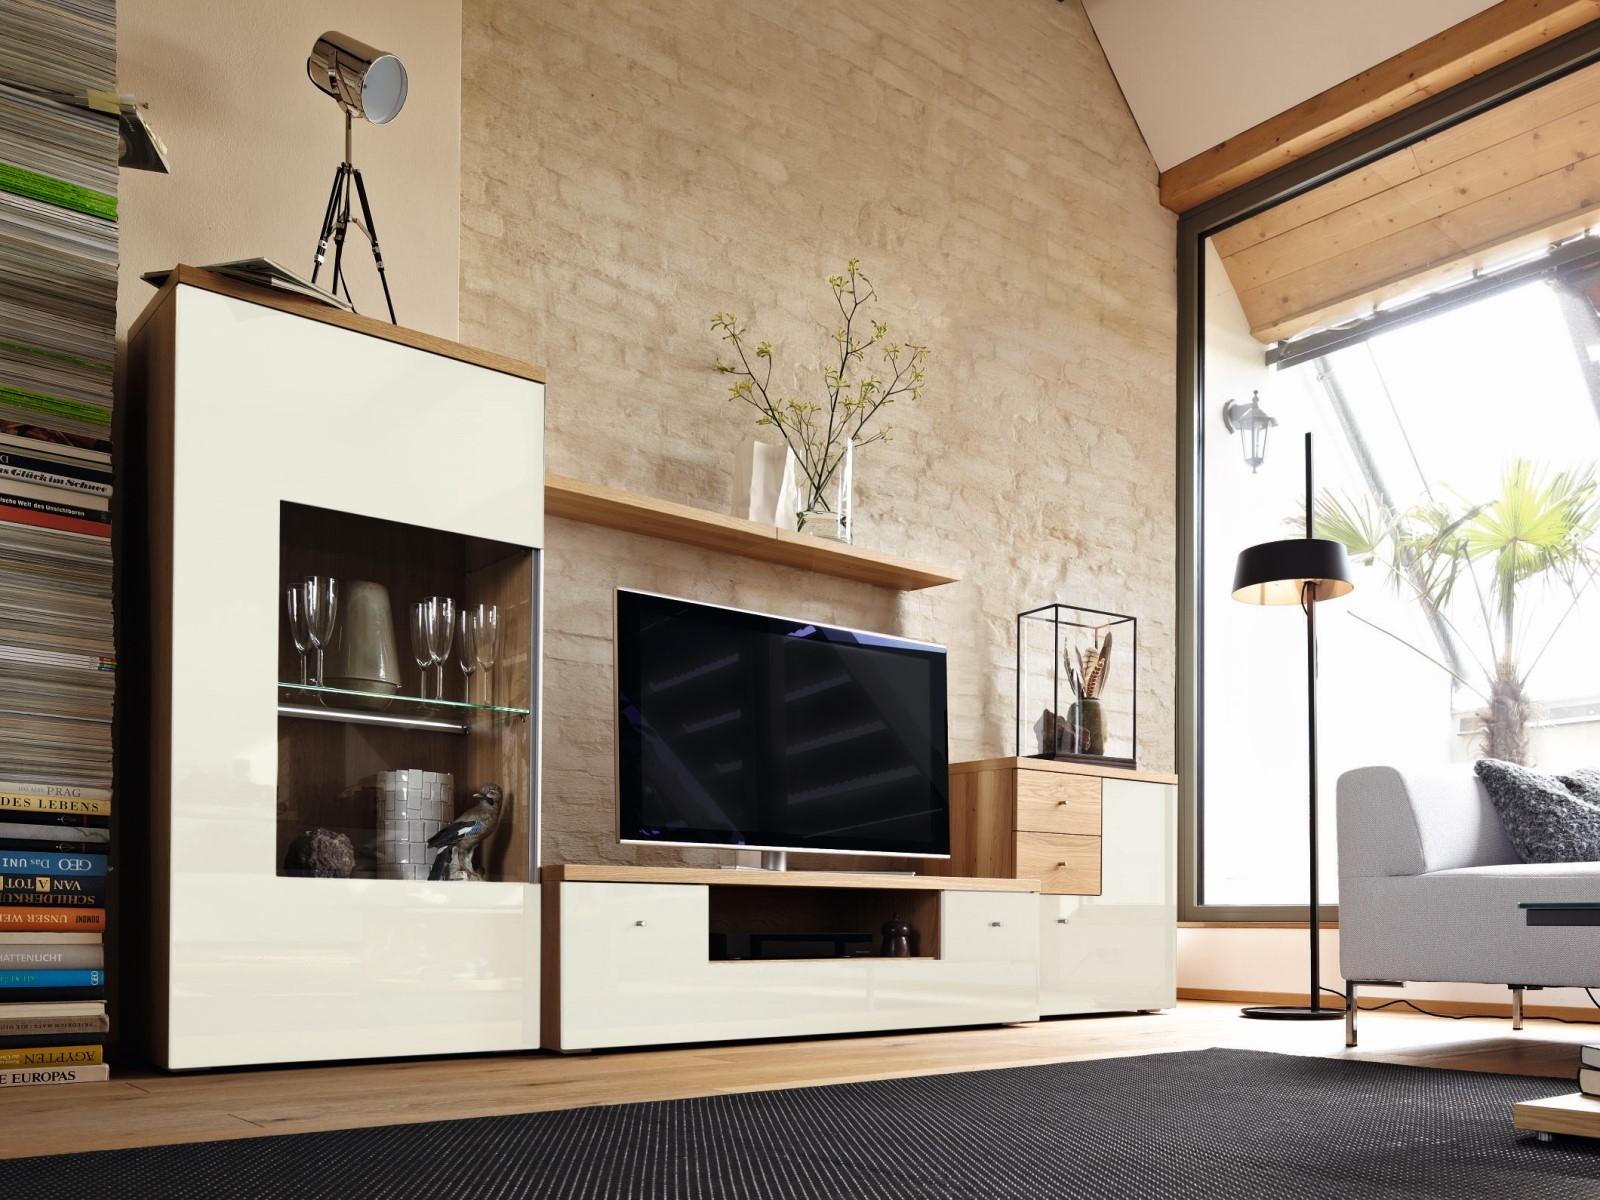 h lsta now time nappali kombin ci 3 innoshop innoshop megfizethet design b torok s. Black Bedroom Furniture Sets. Home Design Ideas